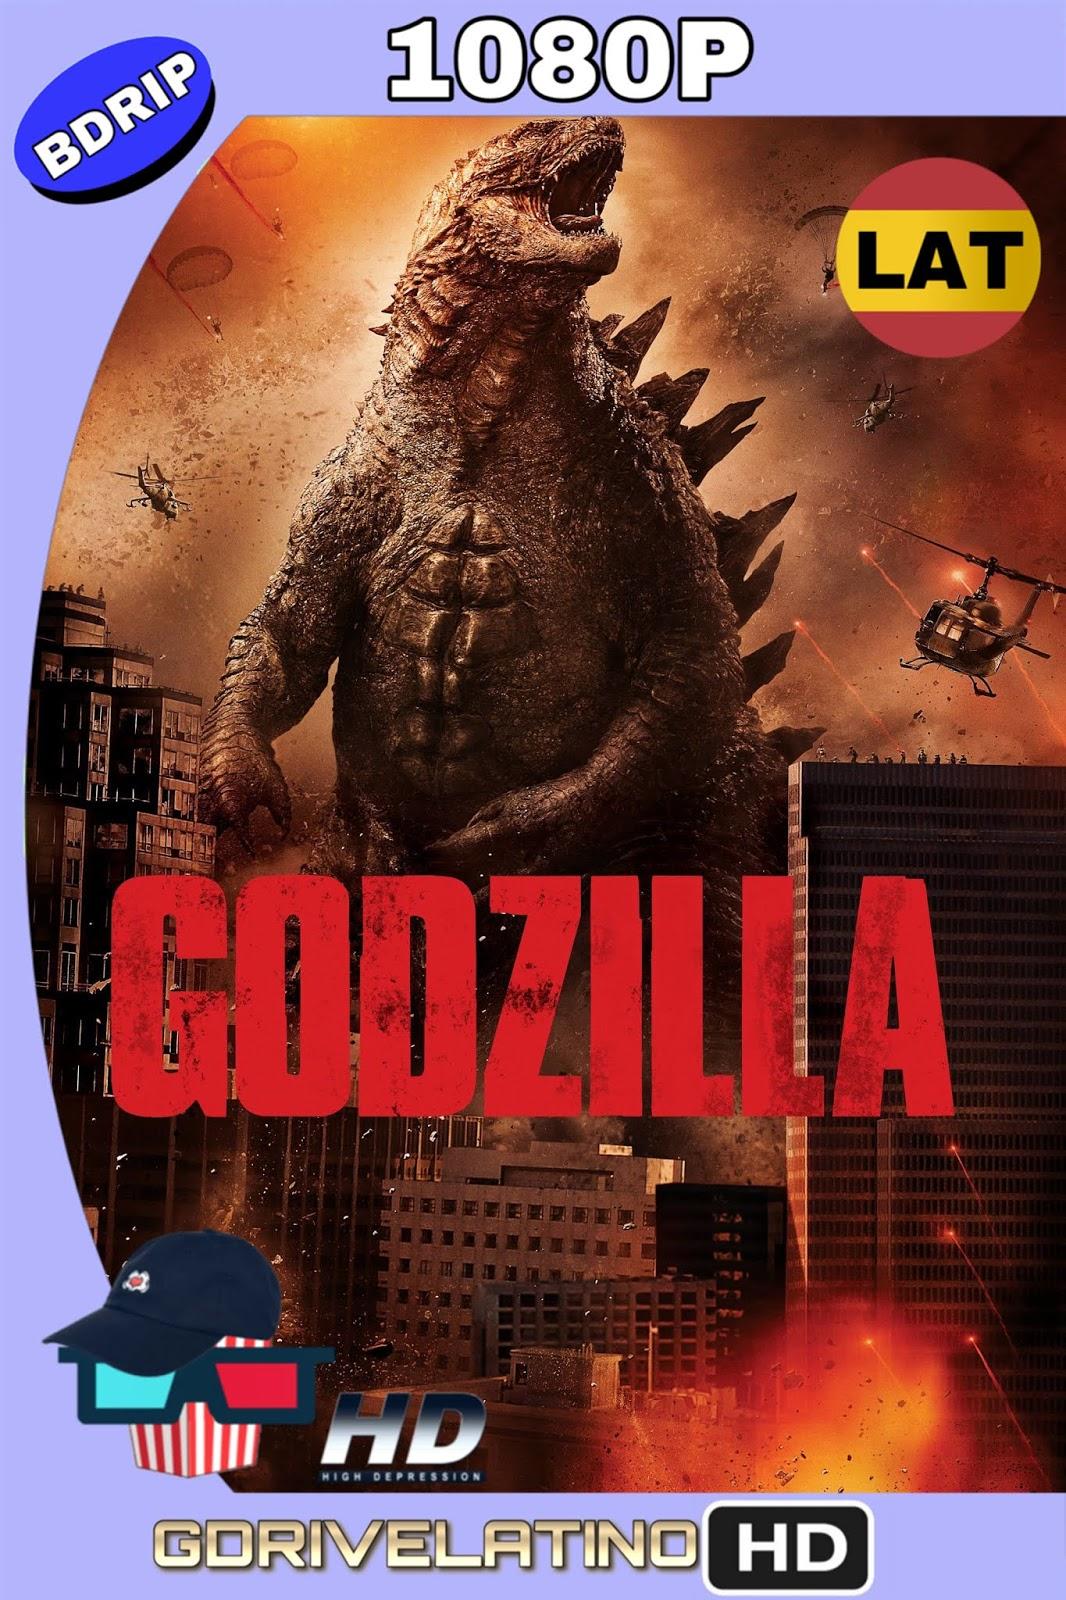 Godzilla (2014) BDrip 1080p (Latino-Inglés) MKV